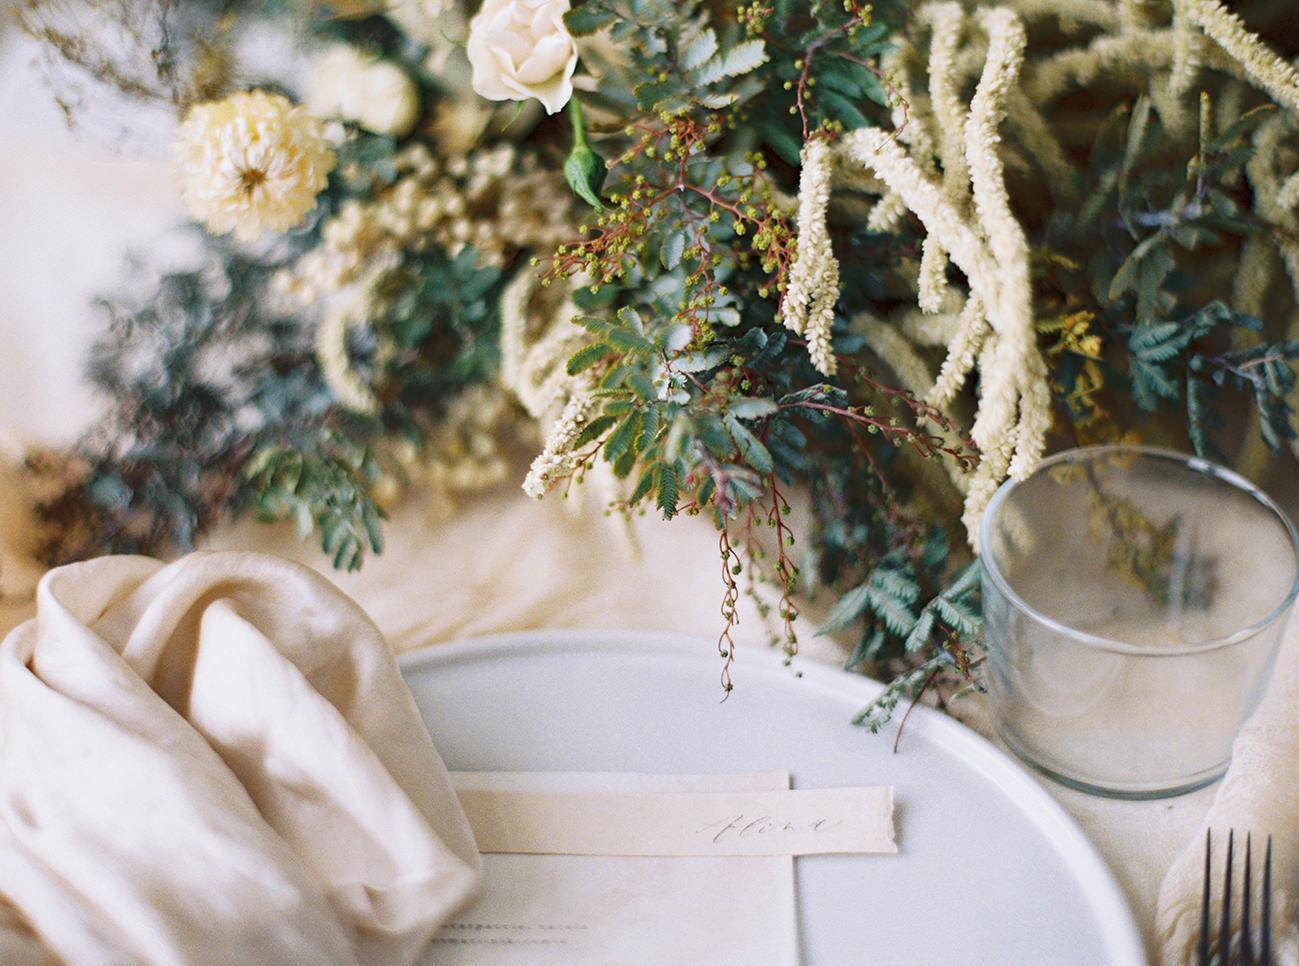 Bridal Inspiration, Wedding Bouquet, Hääkuvaus, Film Wedding Photographer, Table Setting Inspiration, Stationery, Dried Flowers, www.nordandmae.com, www.susannanordvall (20).jpg